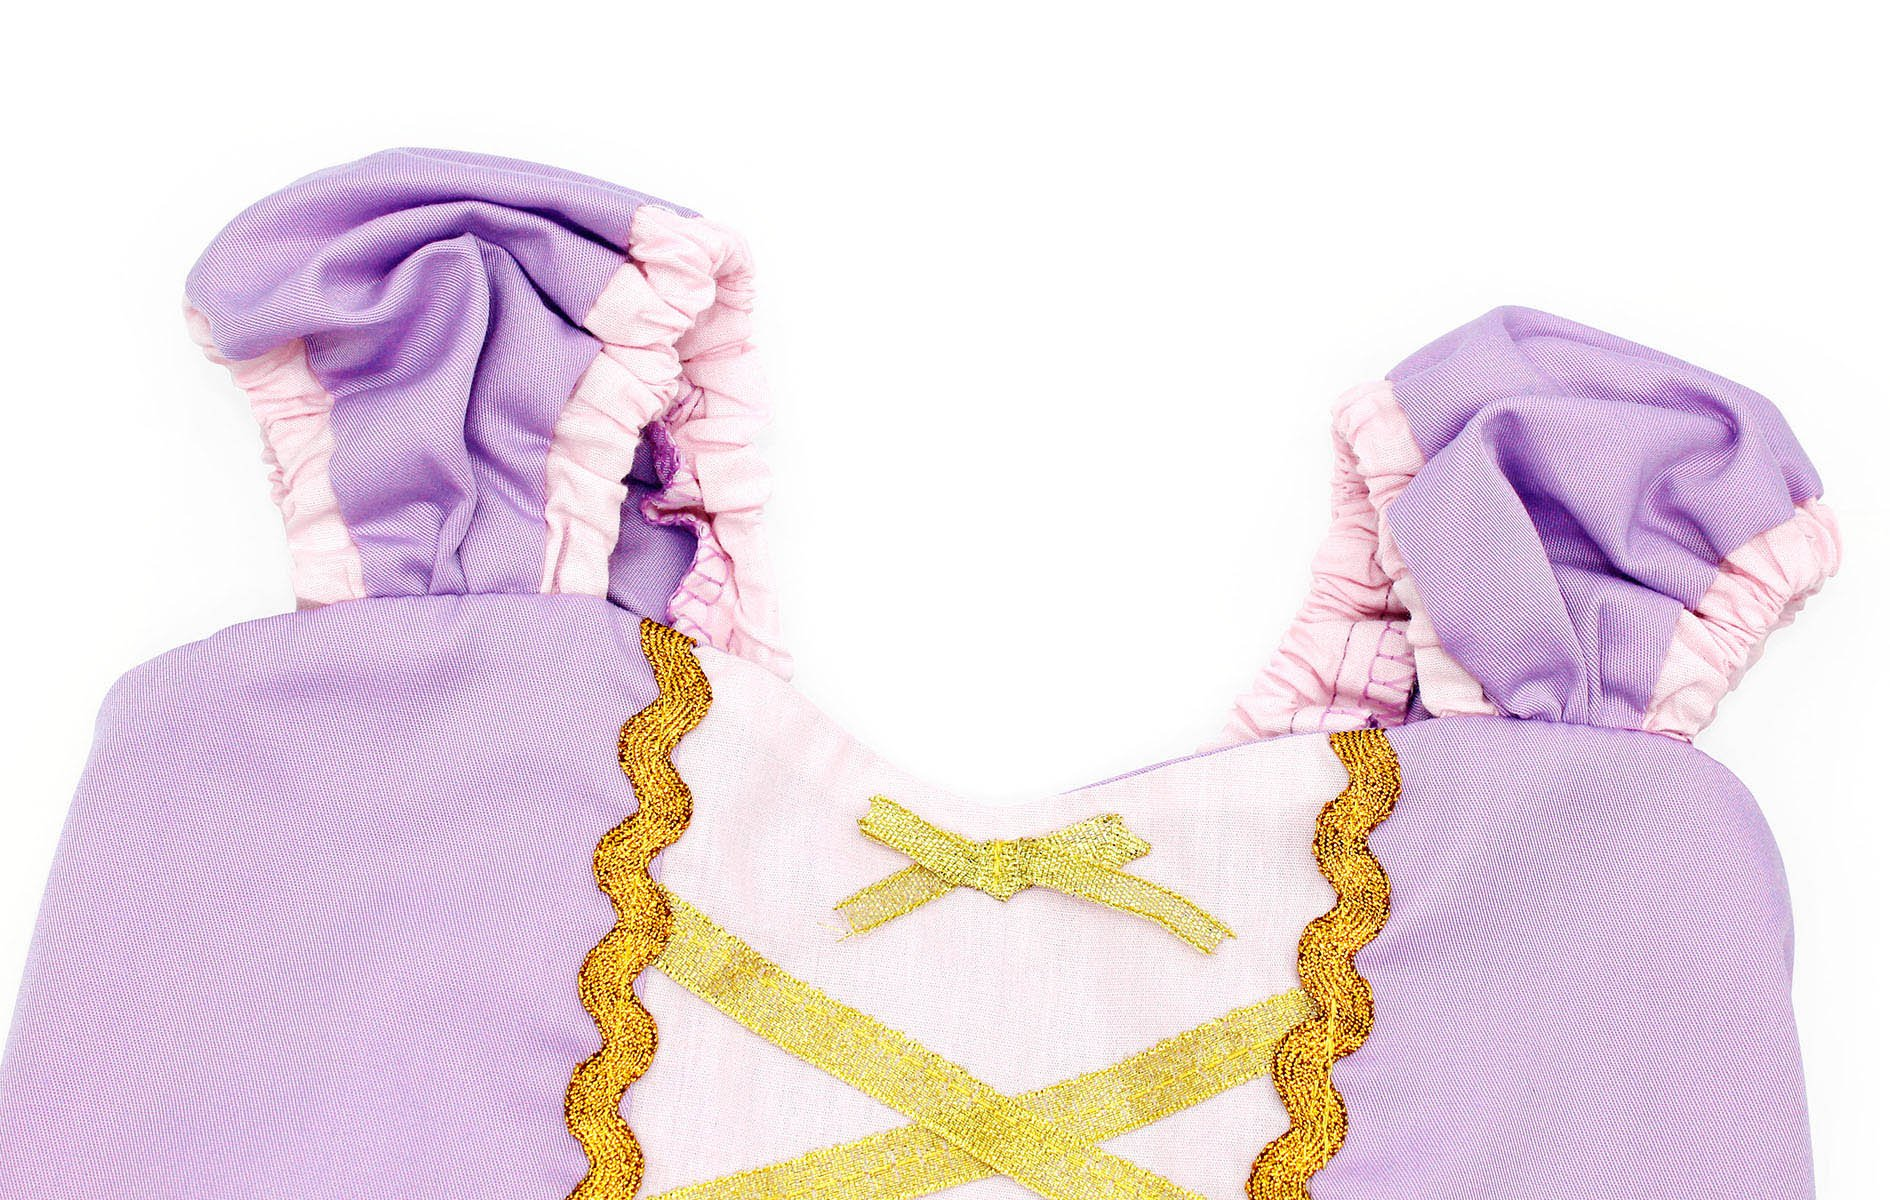 Cotrio Girls Princess Rapunzel Dress up Costume Halloween Cosplay Fancy Party Dresses Size 4T (110, Rapunzel Tutu Dress) by Cotrio (Image #3)